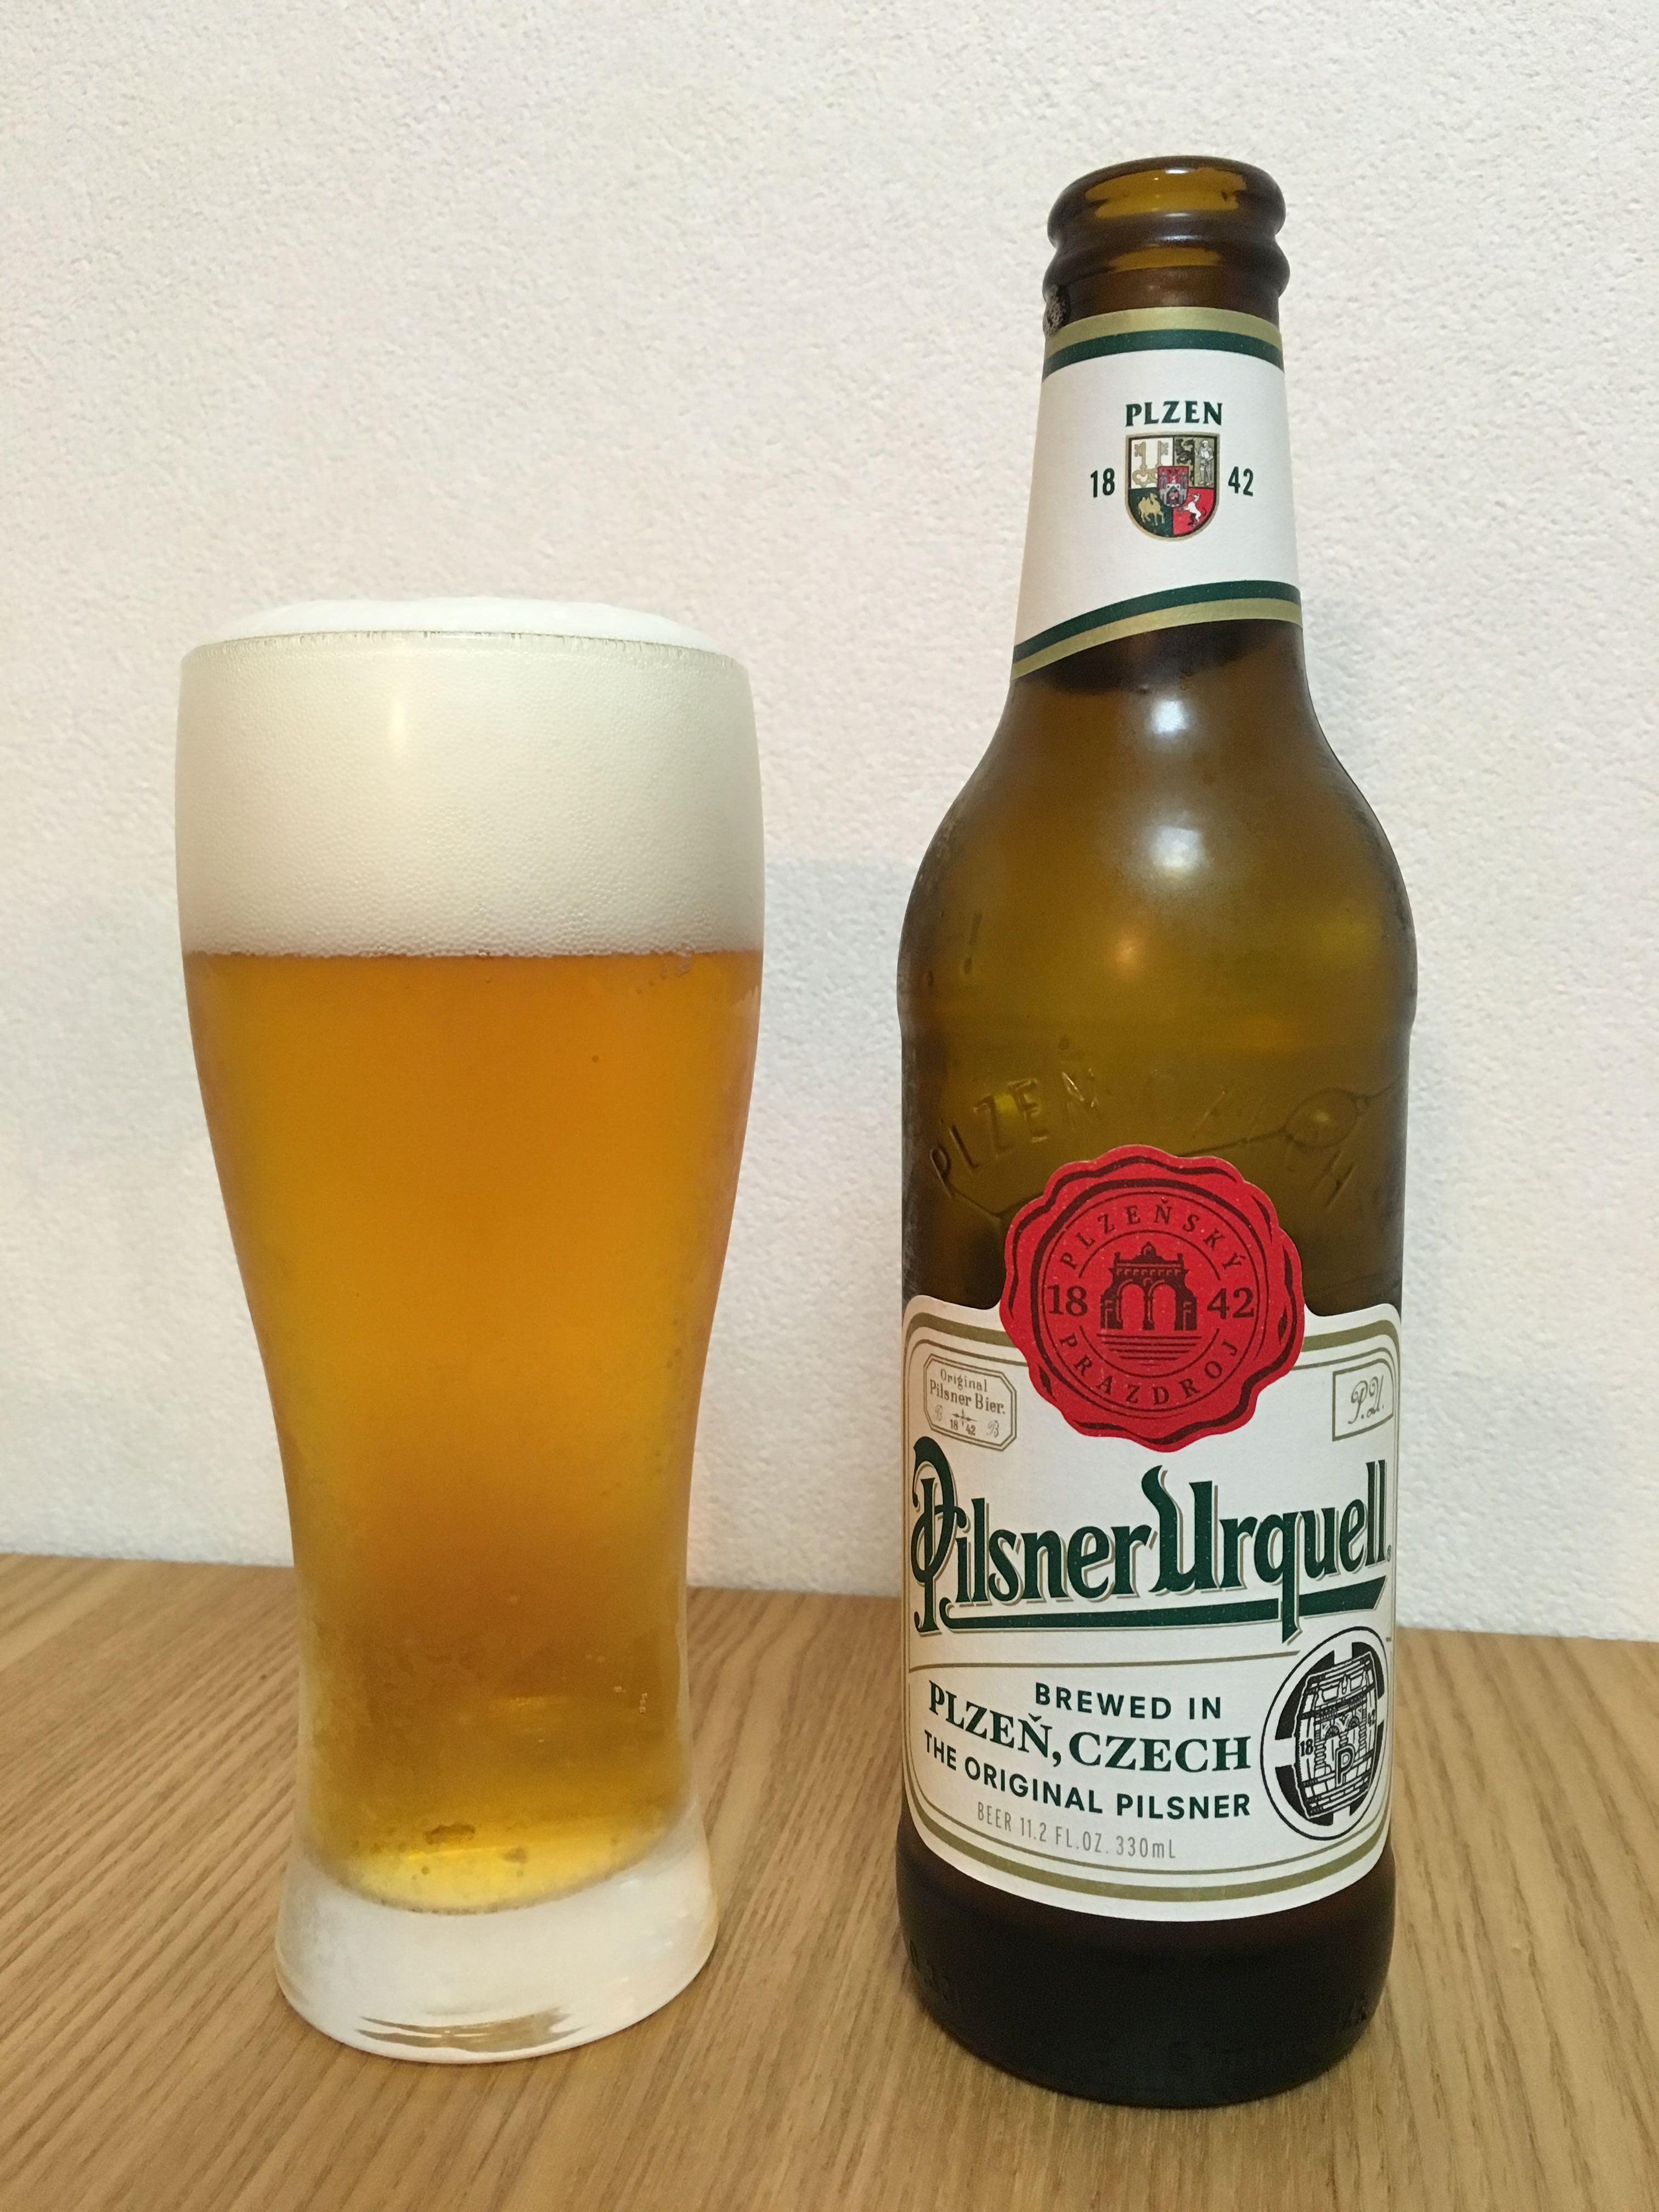 Pilsner Urquell(ピルスナー ウルケル)